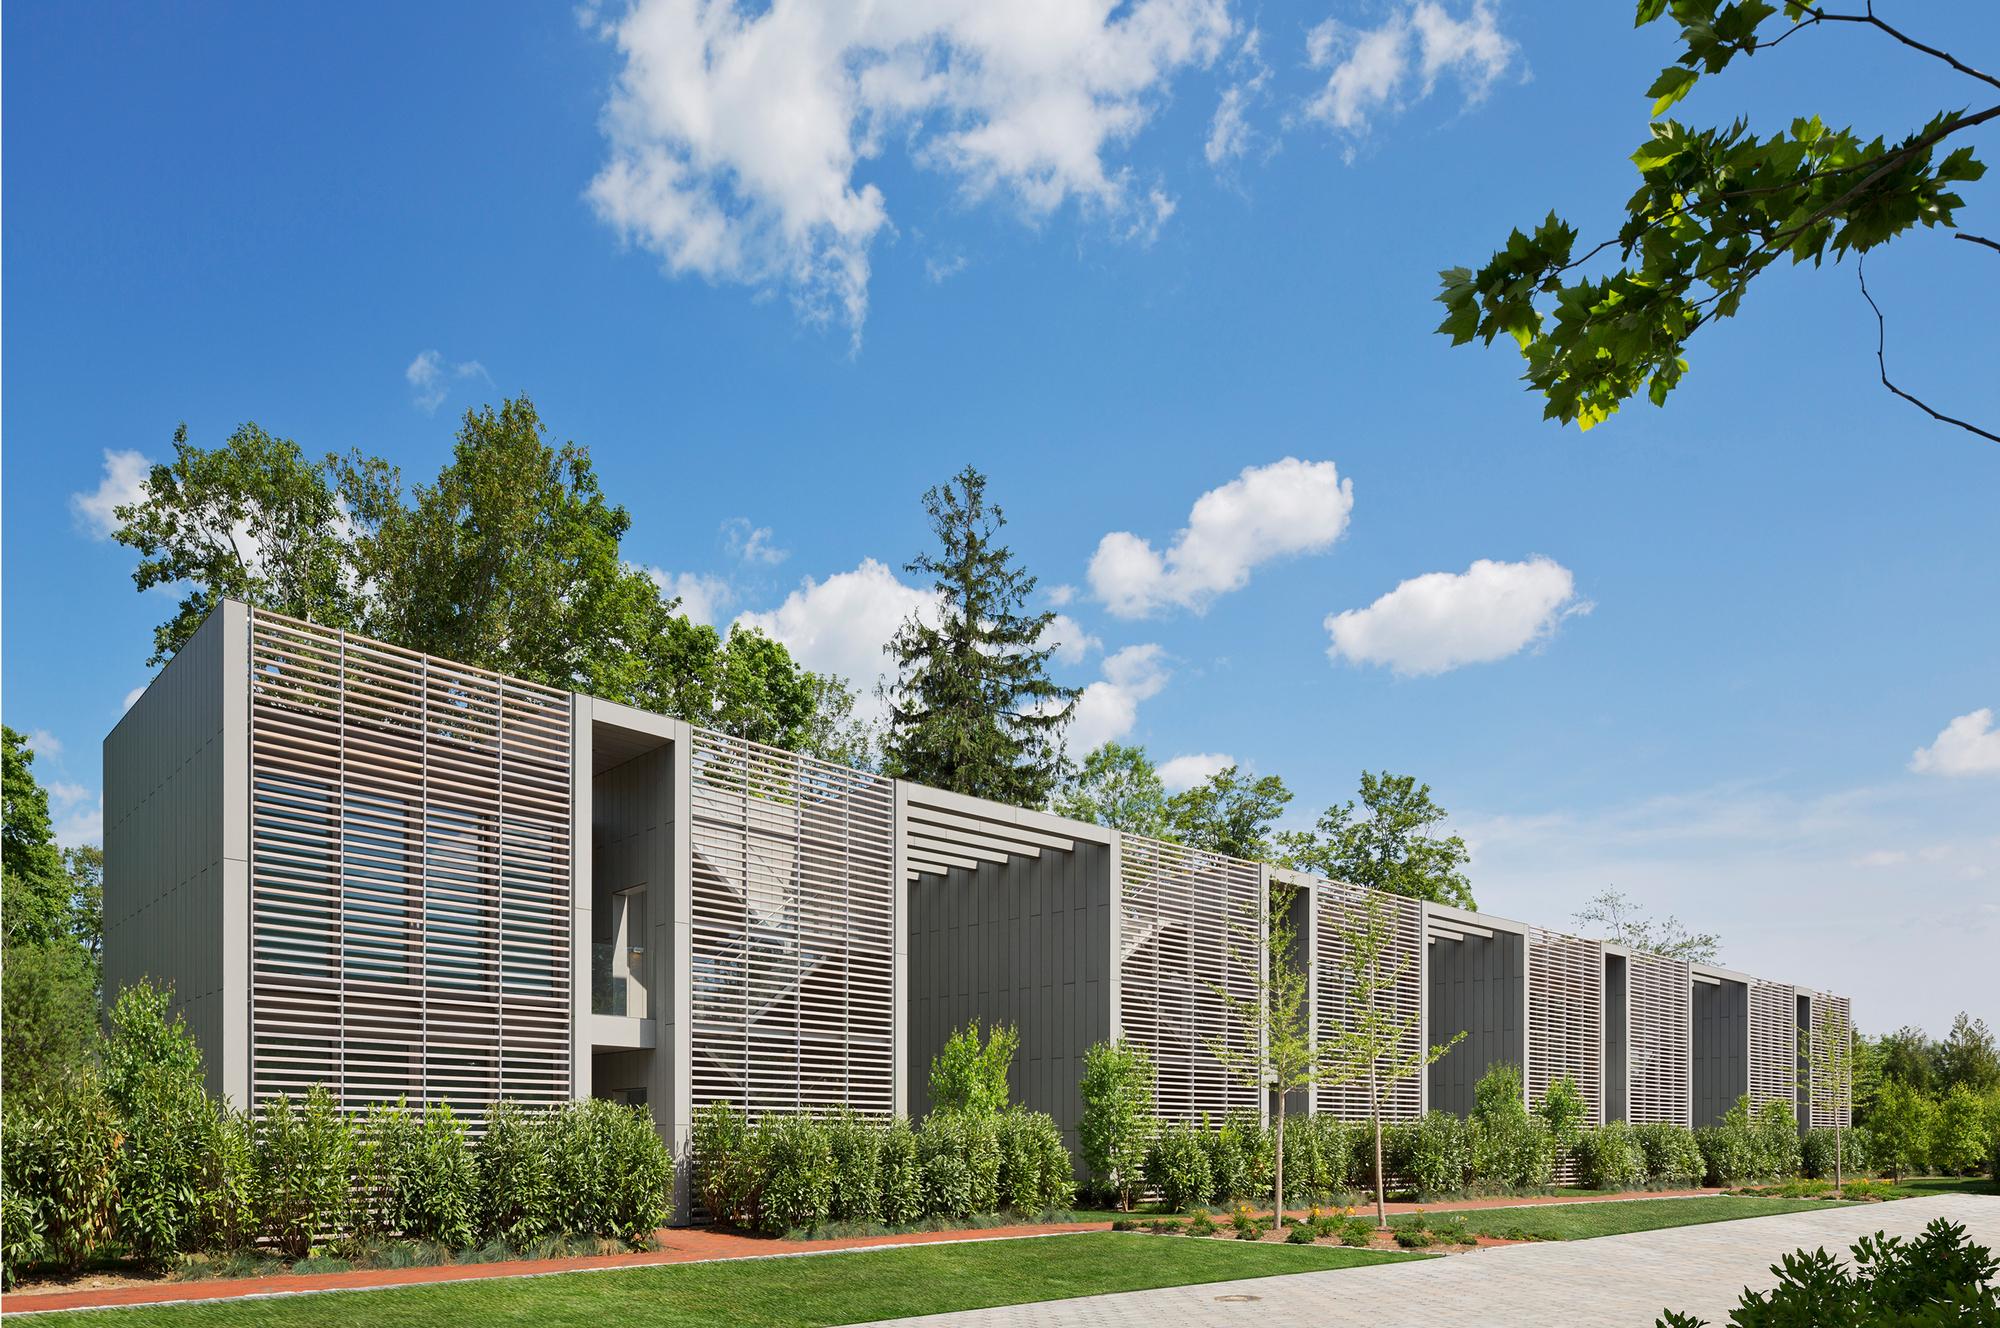 Topping Rose House / Roger Ferris + Partners